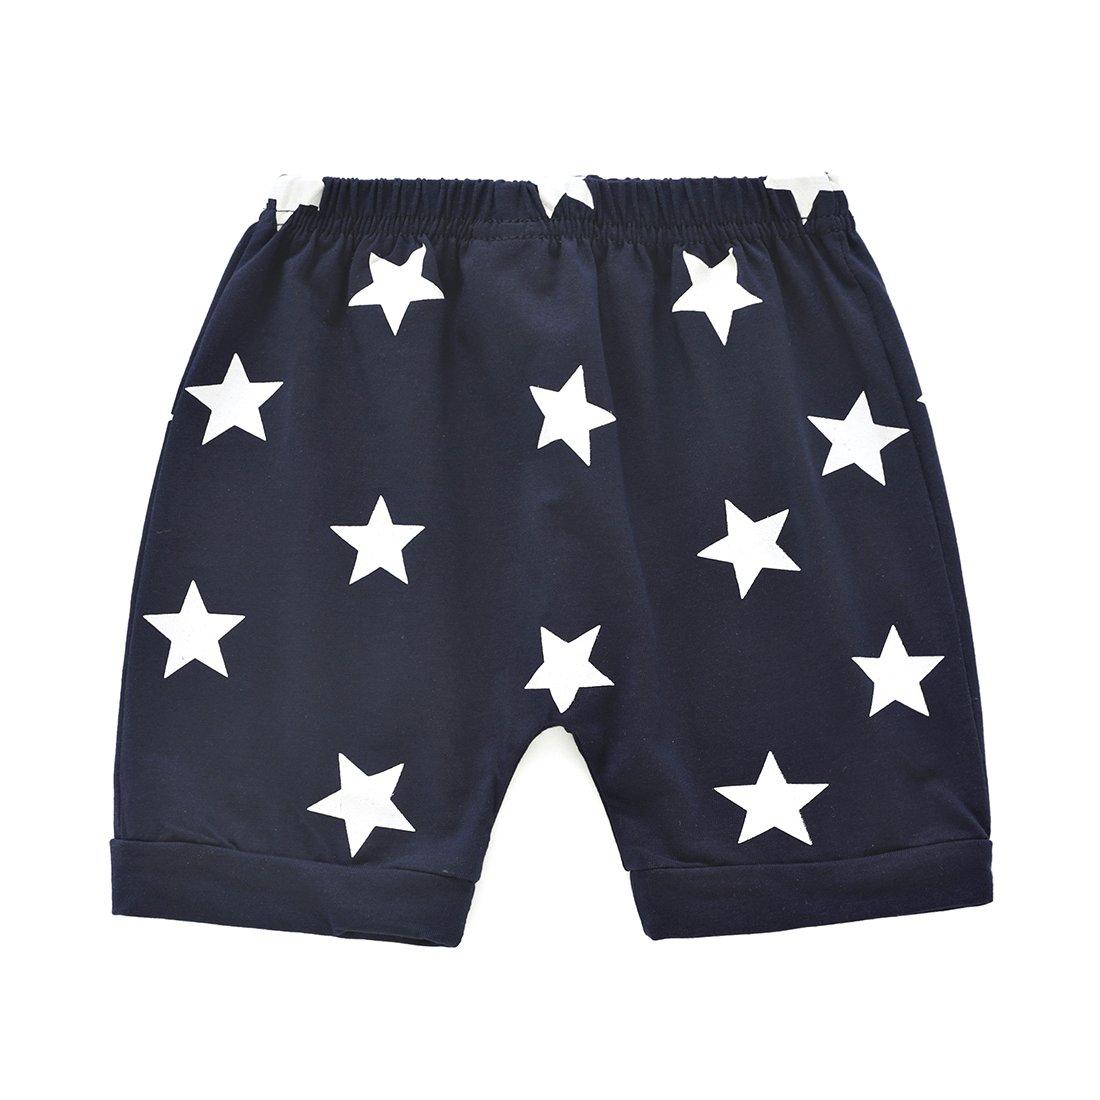 ff02fd10b608 chicnchic Baby Boys Short Sleeve t-Shirts Shorts Set 2pcs Cartoon Plane  Summer Outfits Clothing (12m (6-12m)